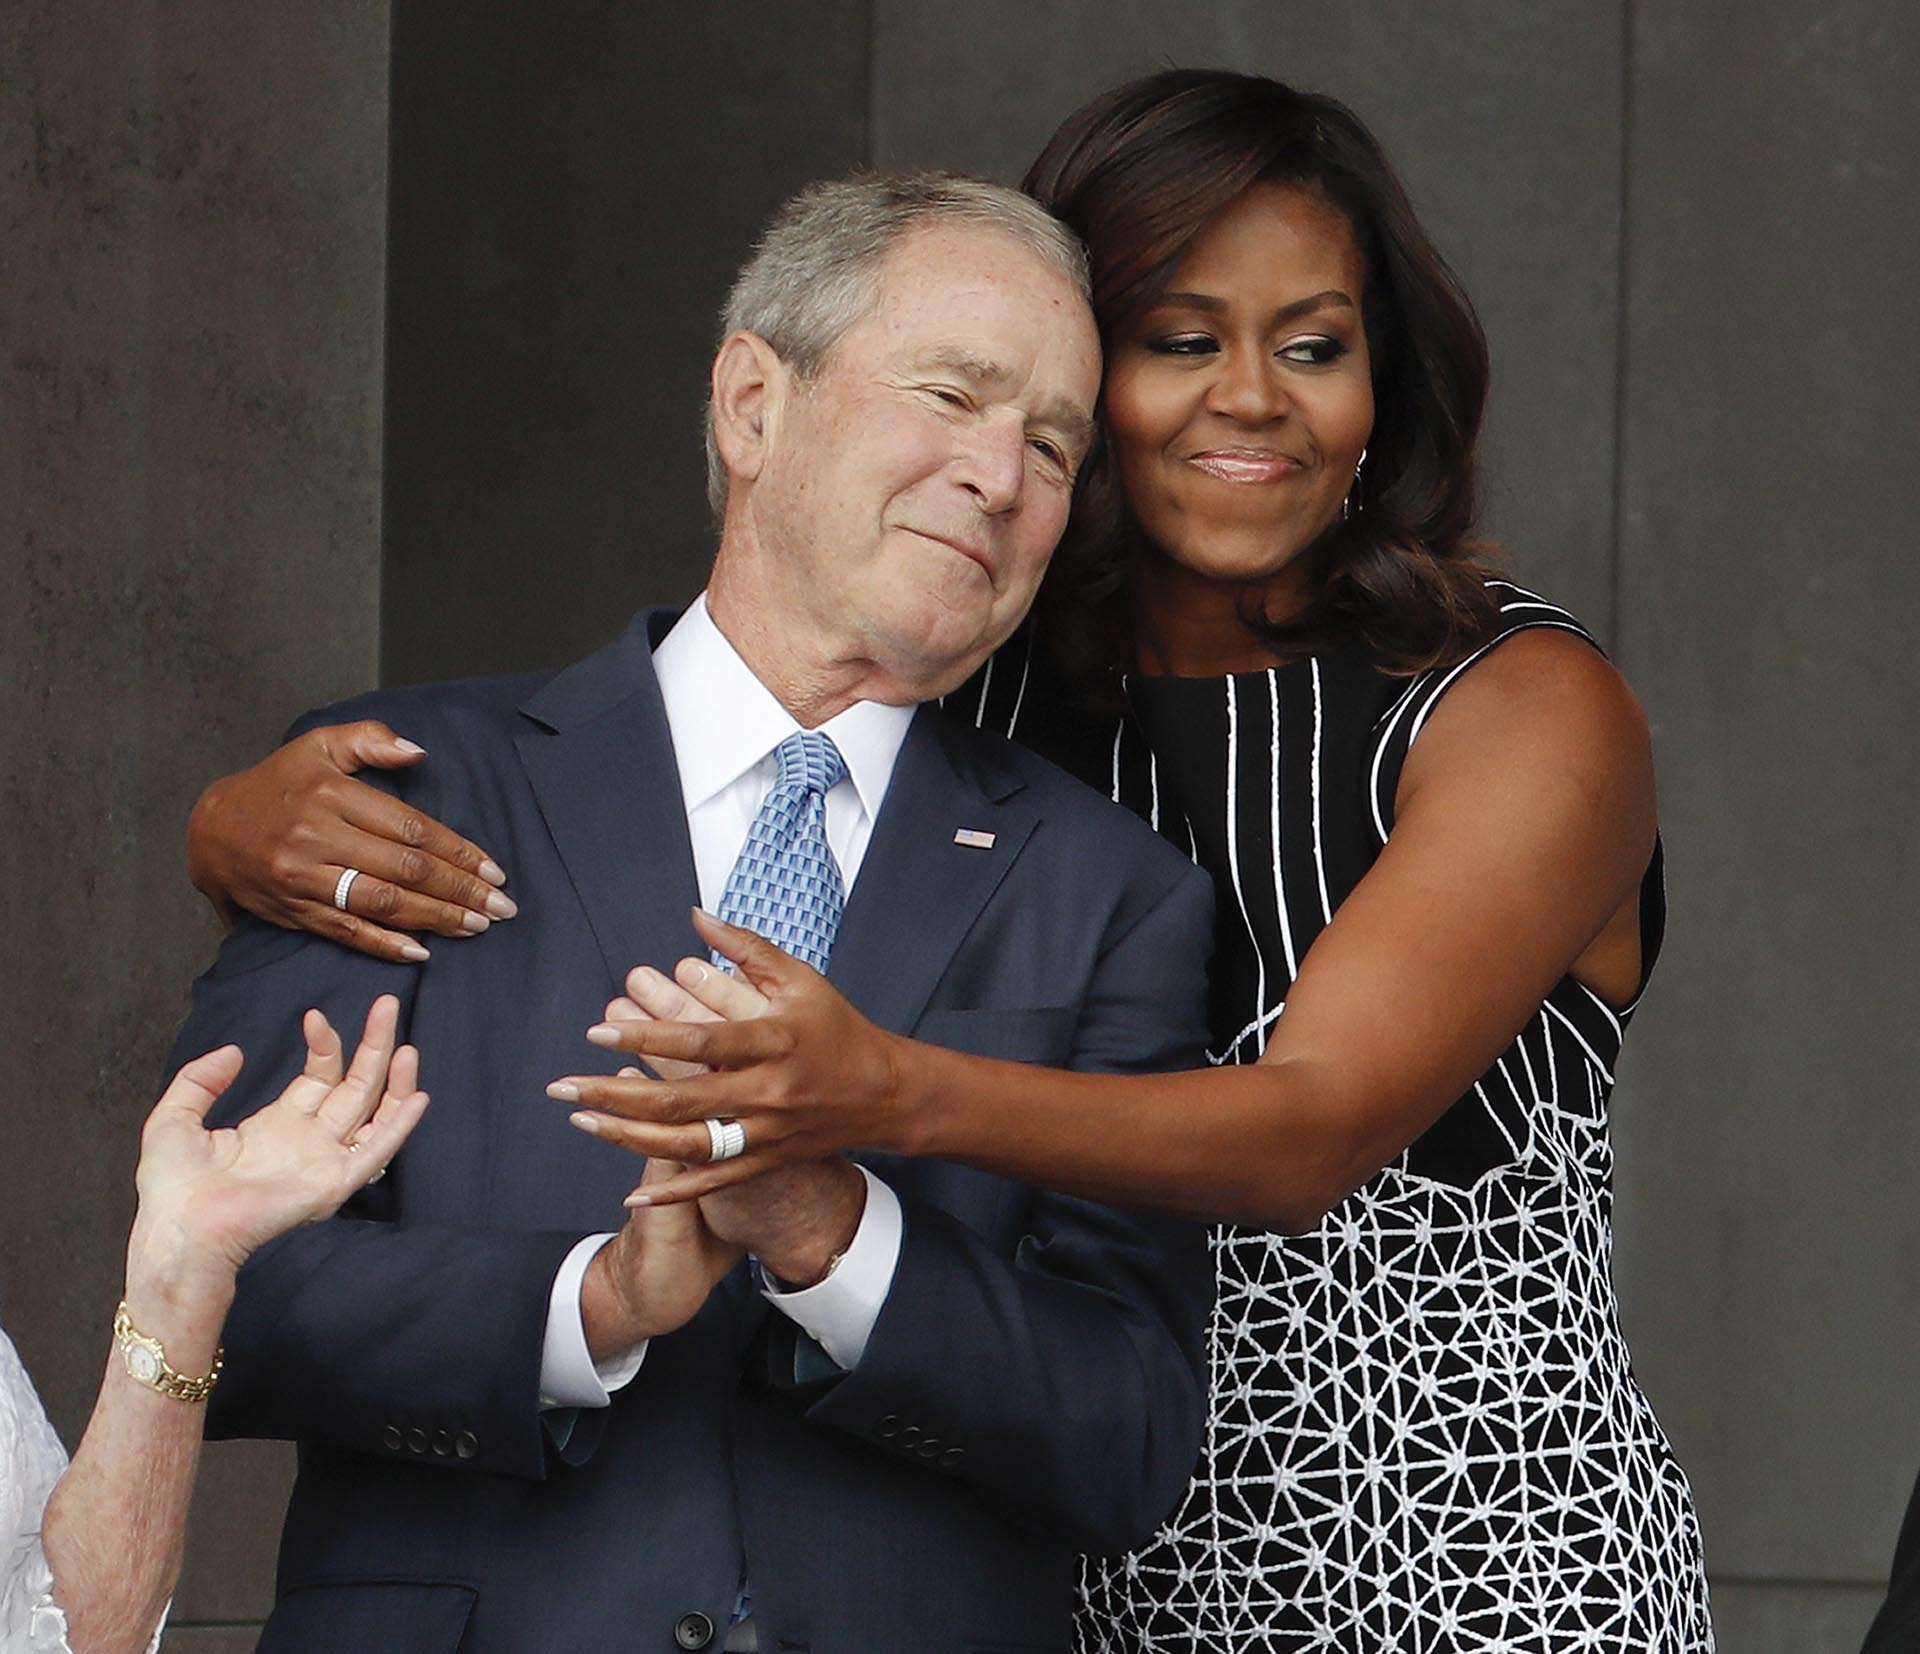 Michelle Obama abraza a George W. Bushen una ceremonia por elSmithsonian Museum of African American History and Culture en Washington el 24 de septiembre de 2016 (AP Photo/Pablo Martinez Monsivais)